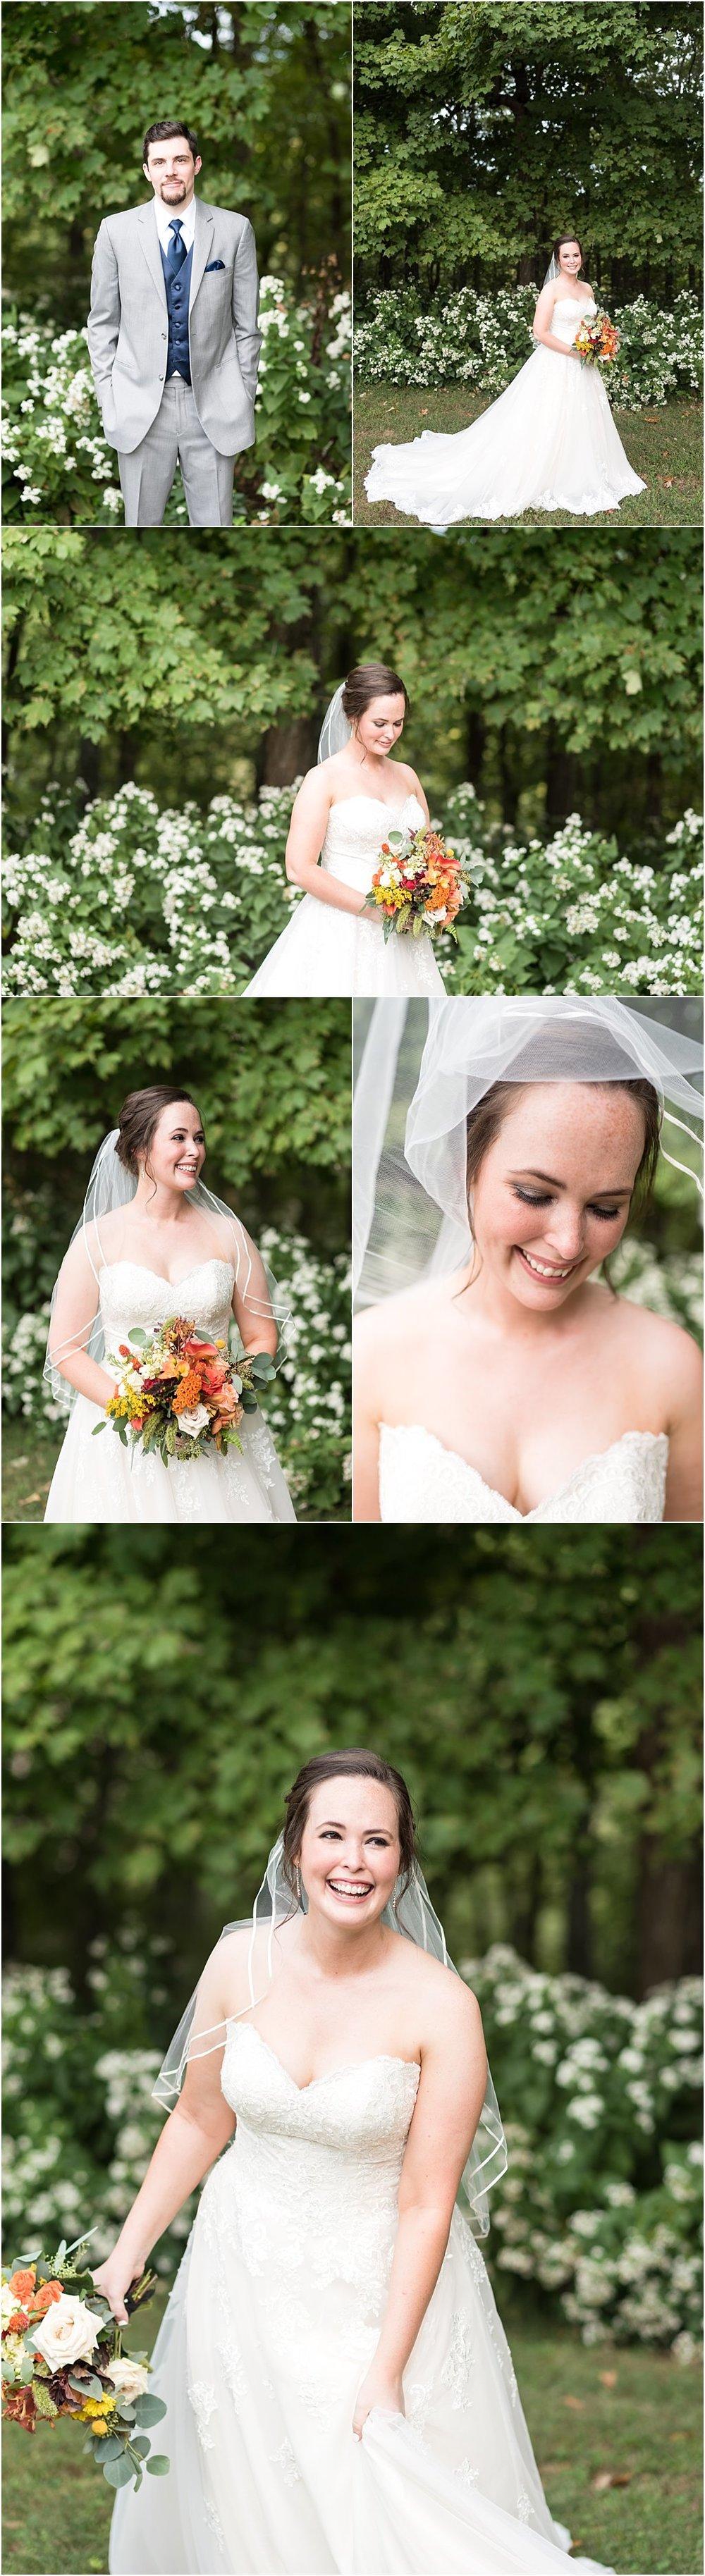 Nolan-And-Leanna-Vanderbilt-Dyer-Observatory-Wedding-in-Brentwood-TN-Nashville-Wedding-Photographers+4